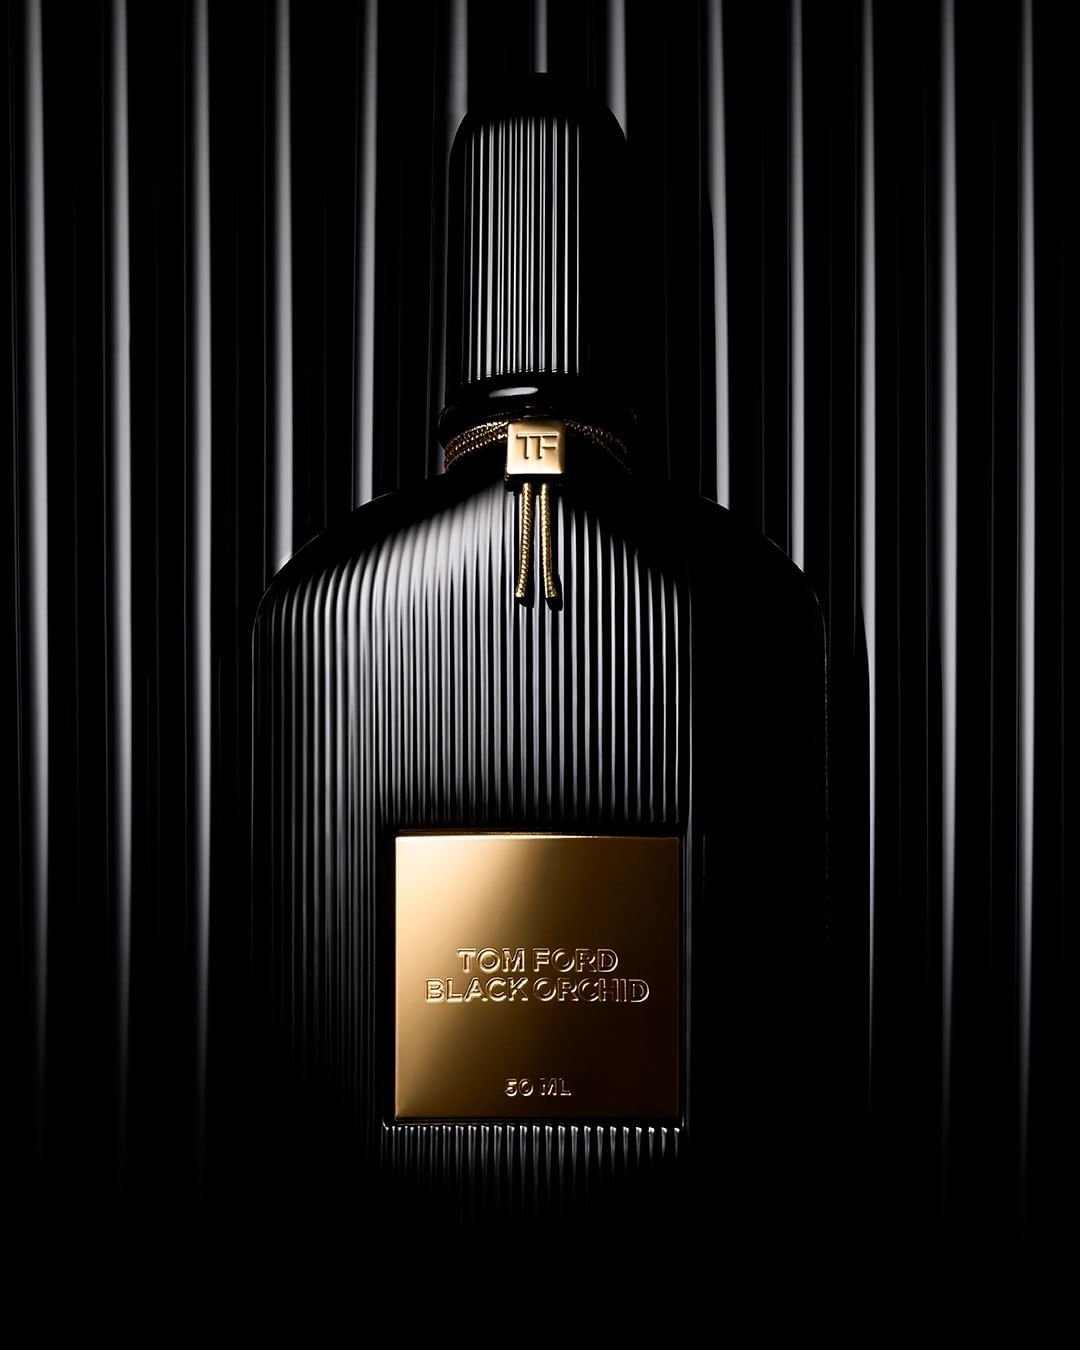 Pin By Anton Puigdomenech Franquesa On Cosmetiques Black Orchid Tom Ford Black Orchid Tom Ford Beauty